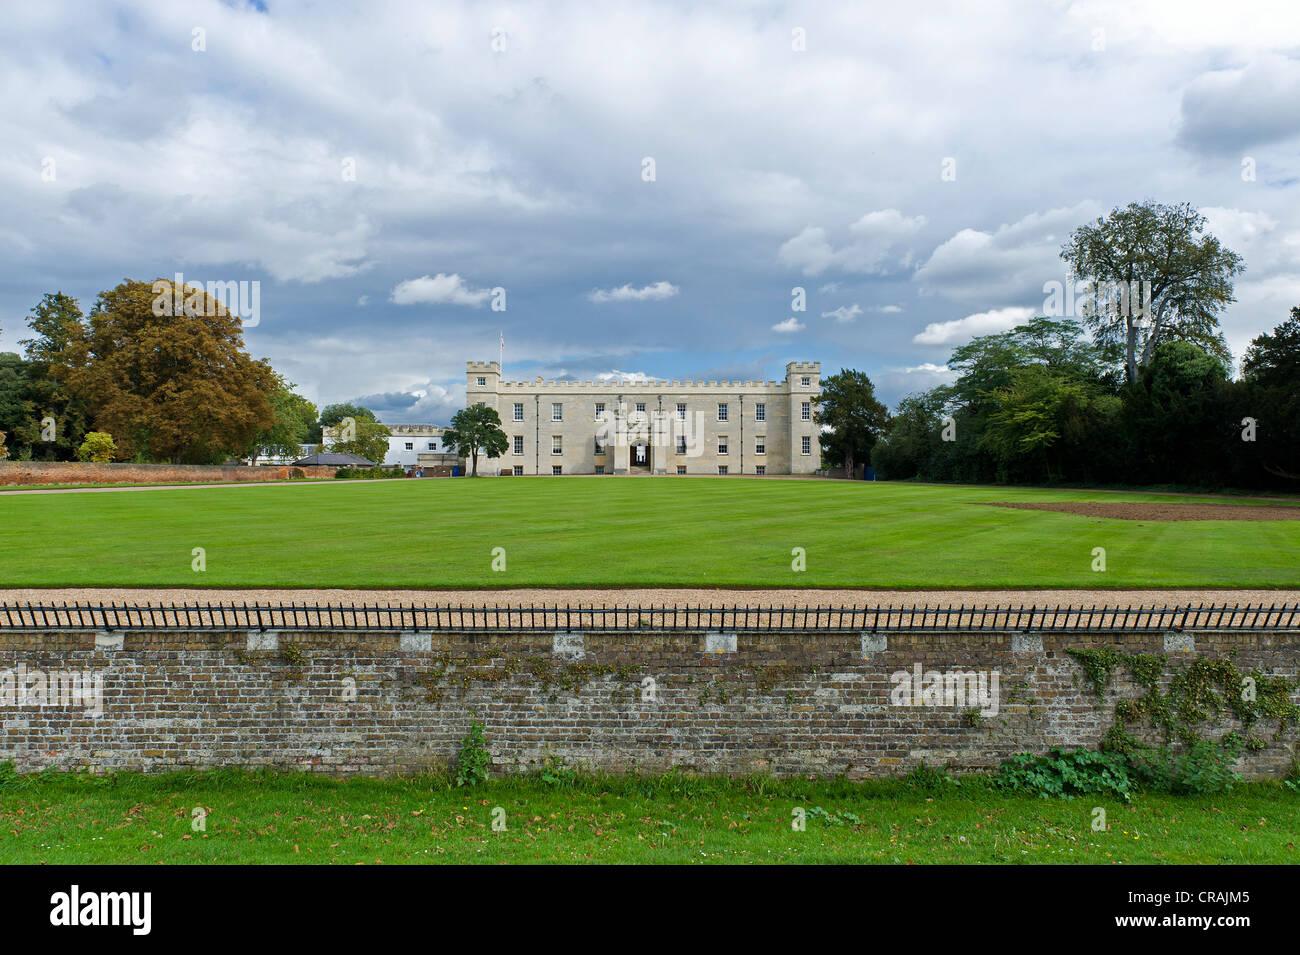 Syon House, duque de Northumberland, la residencia londinense, Isleworth, Hounslow, Londres, Inglaterra, Reino Unido, Foto de stock